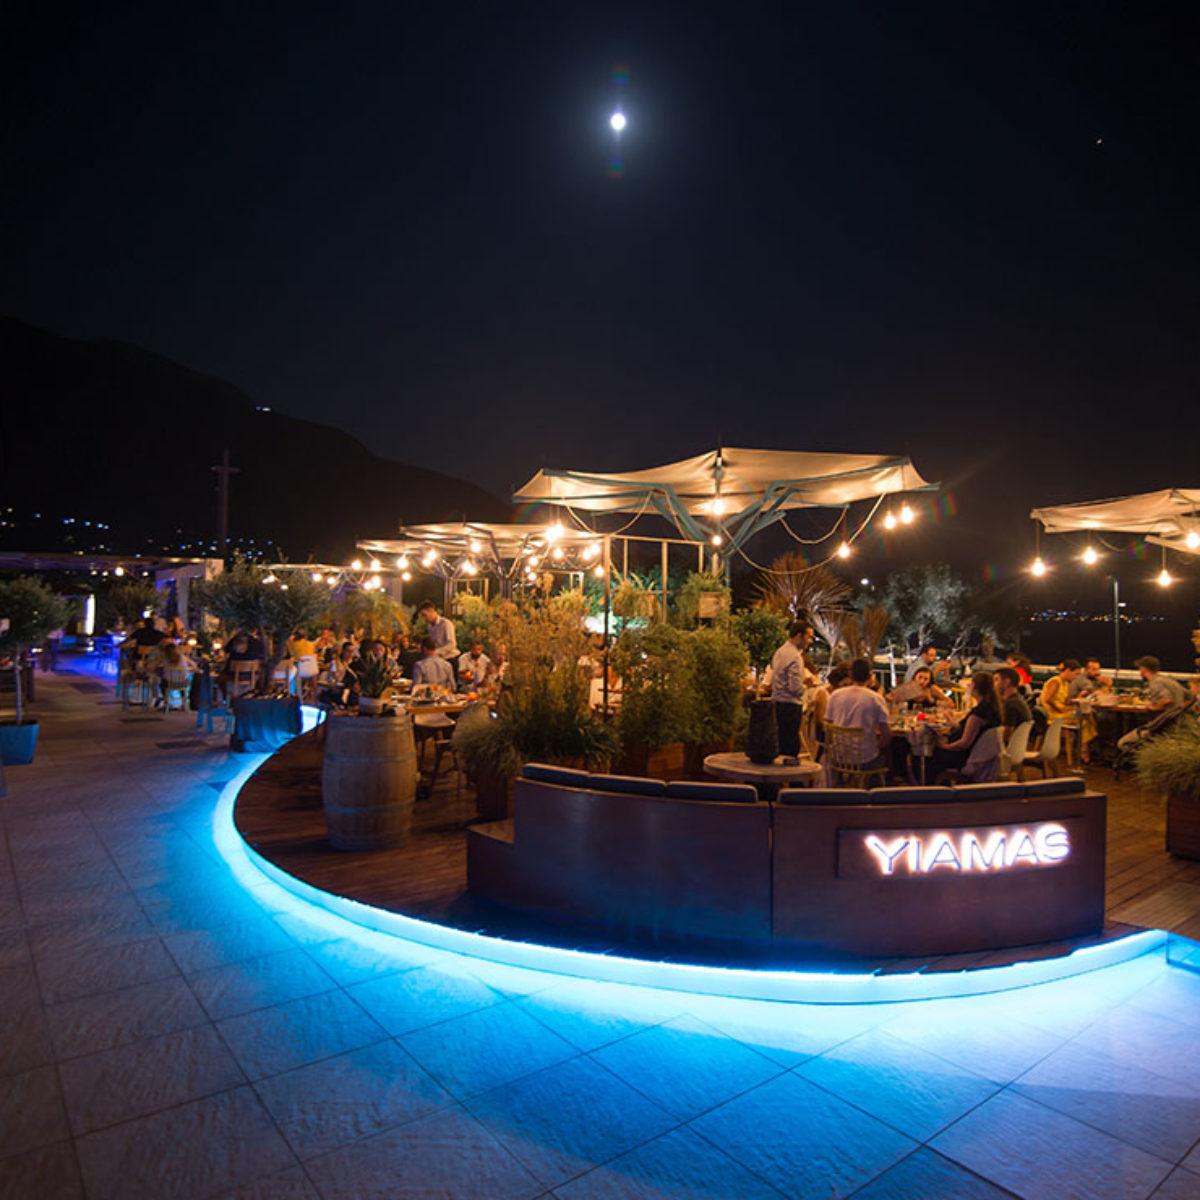 Yiamas Gastro Bar - Restaurant Καλαμάτα - Μοντέρνα Ευρωπαϊκή Κουζίνα